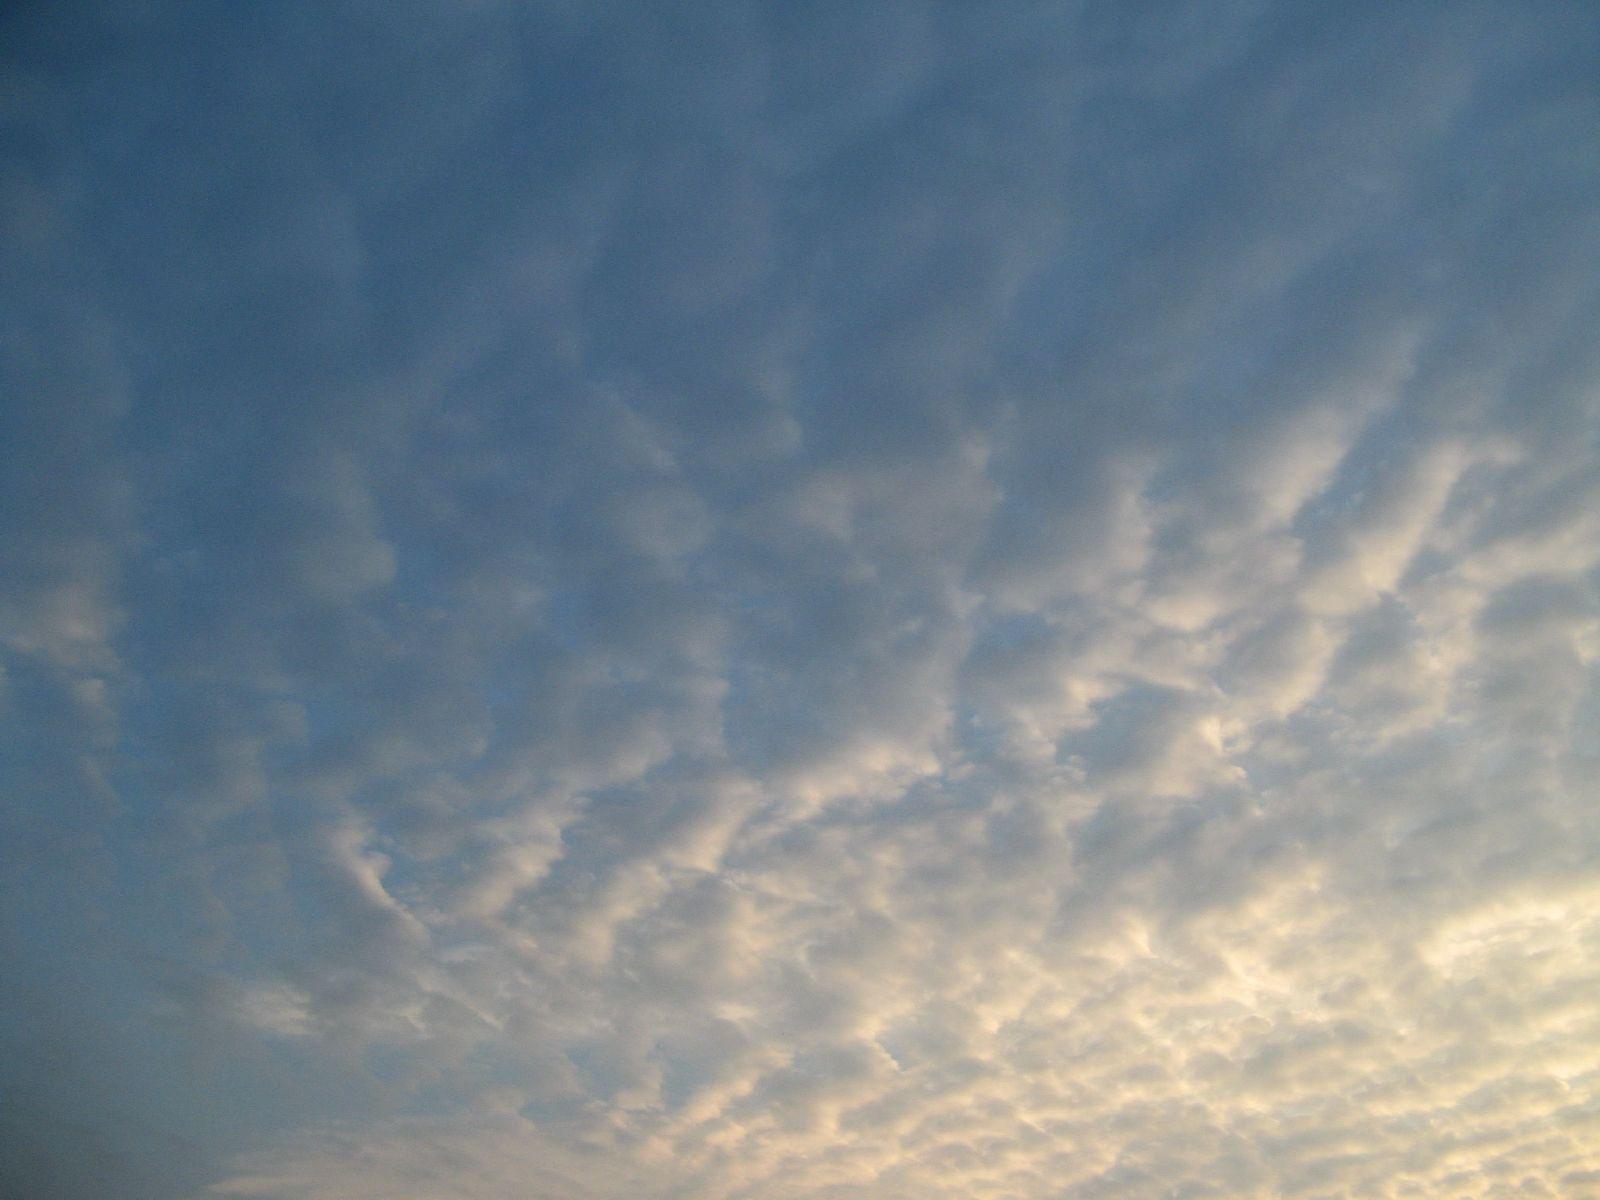 Himmel-Wolken-Foto_Textur_B_0012